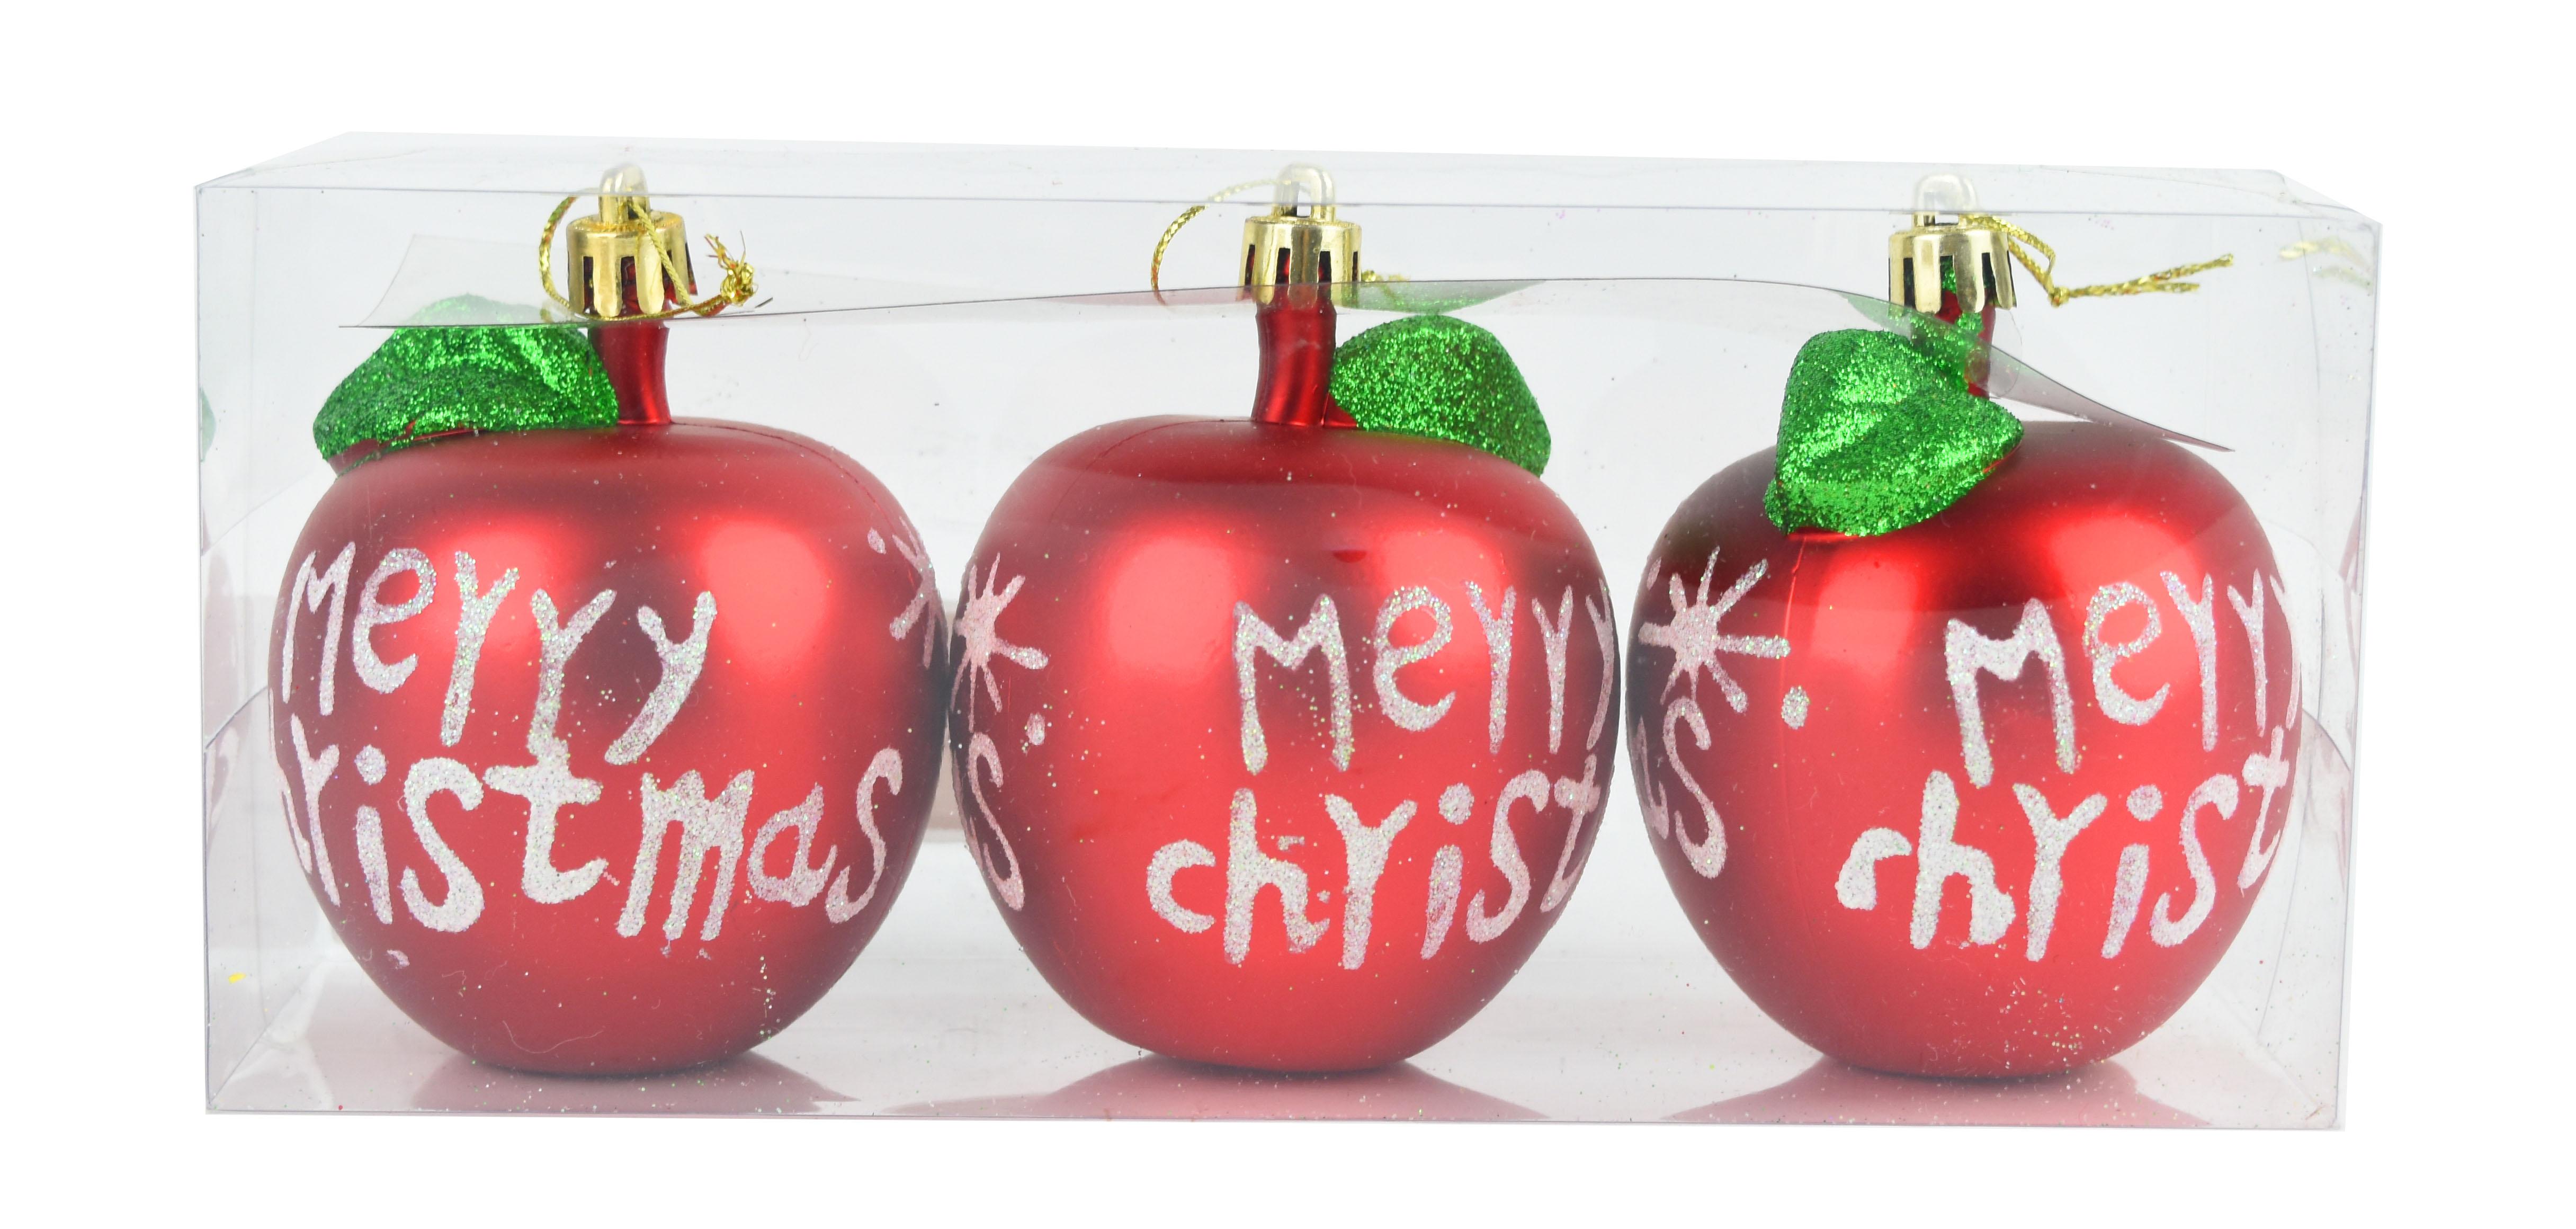 X射線【X299322】8公分蘋果鍍金球(紅)3入,聖誕節/聖誕佈置/聖誕鍍金球/聖誕球/吊飾/會場佈置/DIY/材料包